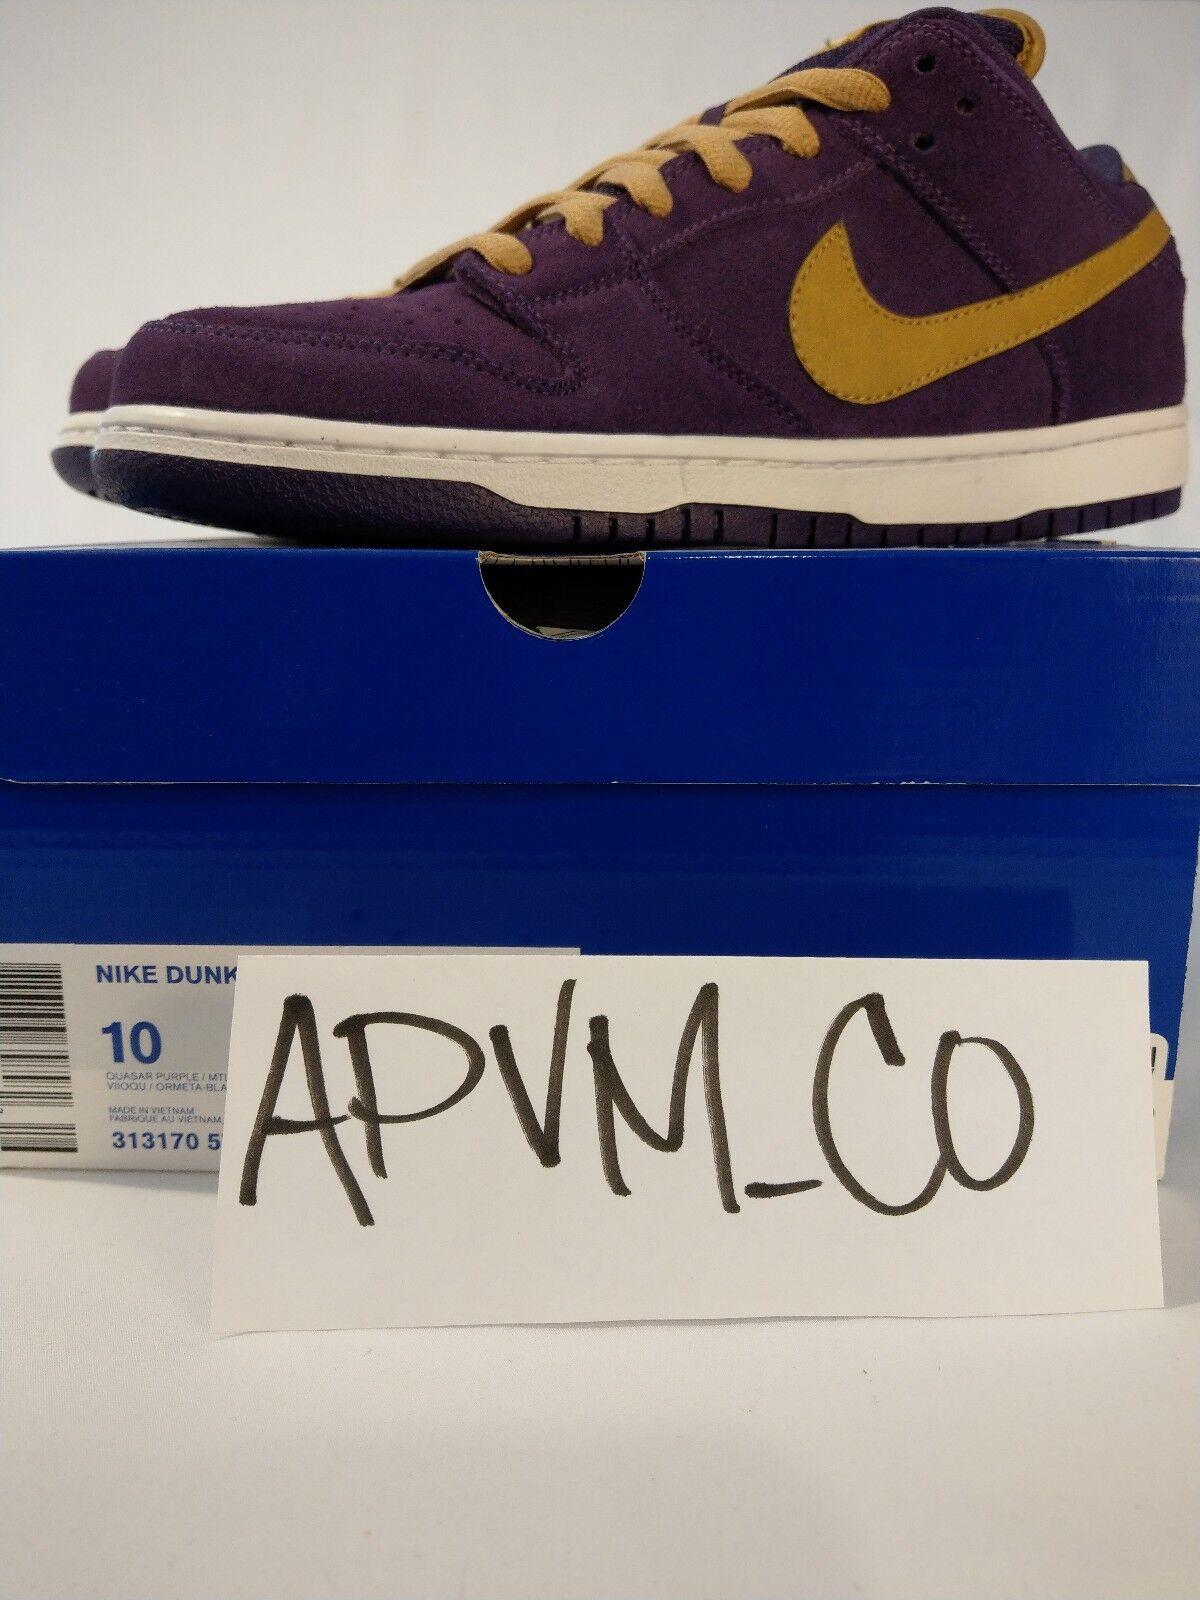 Nike Dunk Low Premium SB NEW Sz 10 CROWN  Royal PURPLE 313170-571 RARE DS